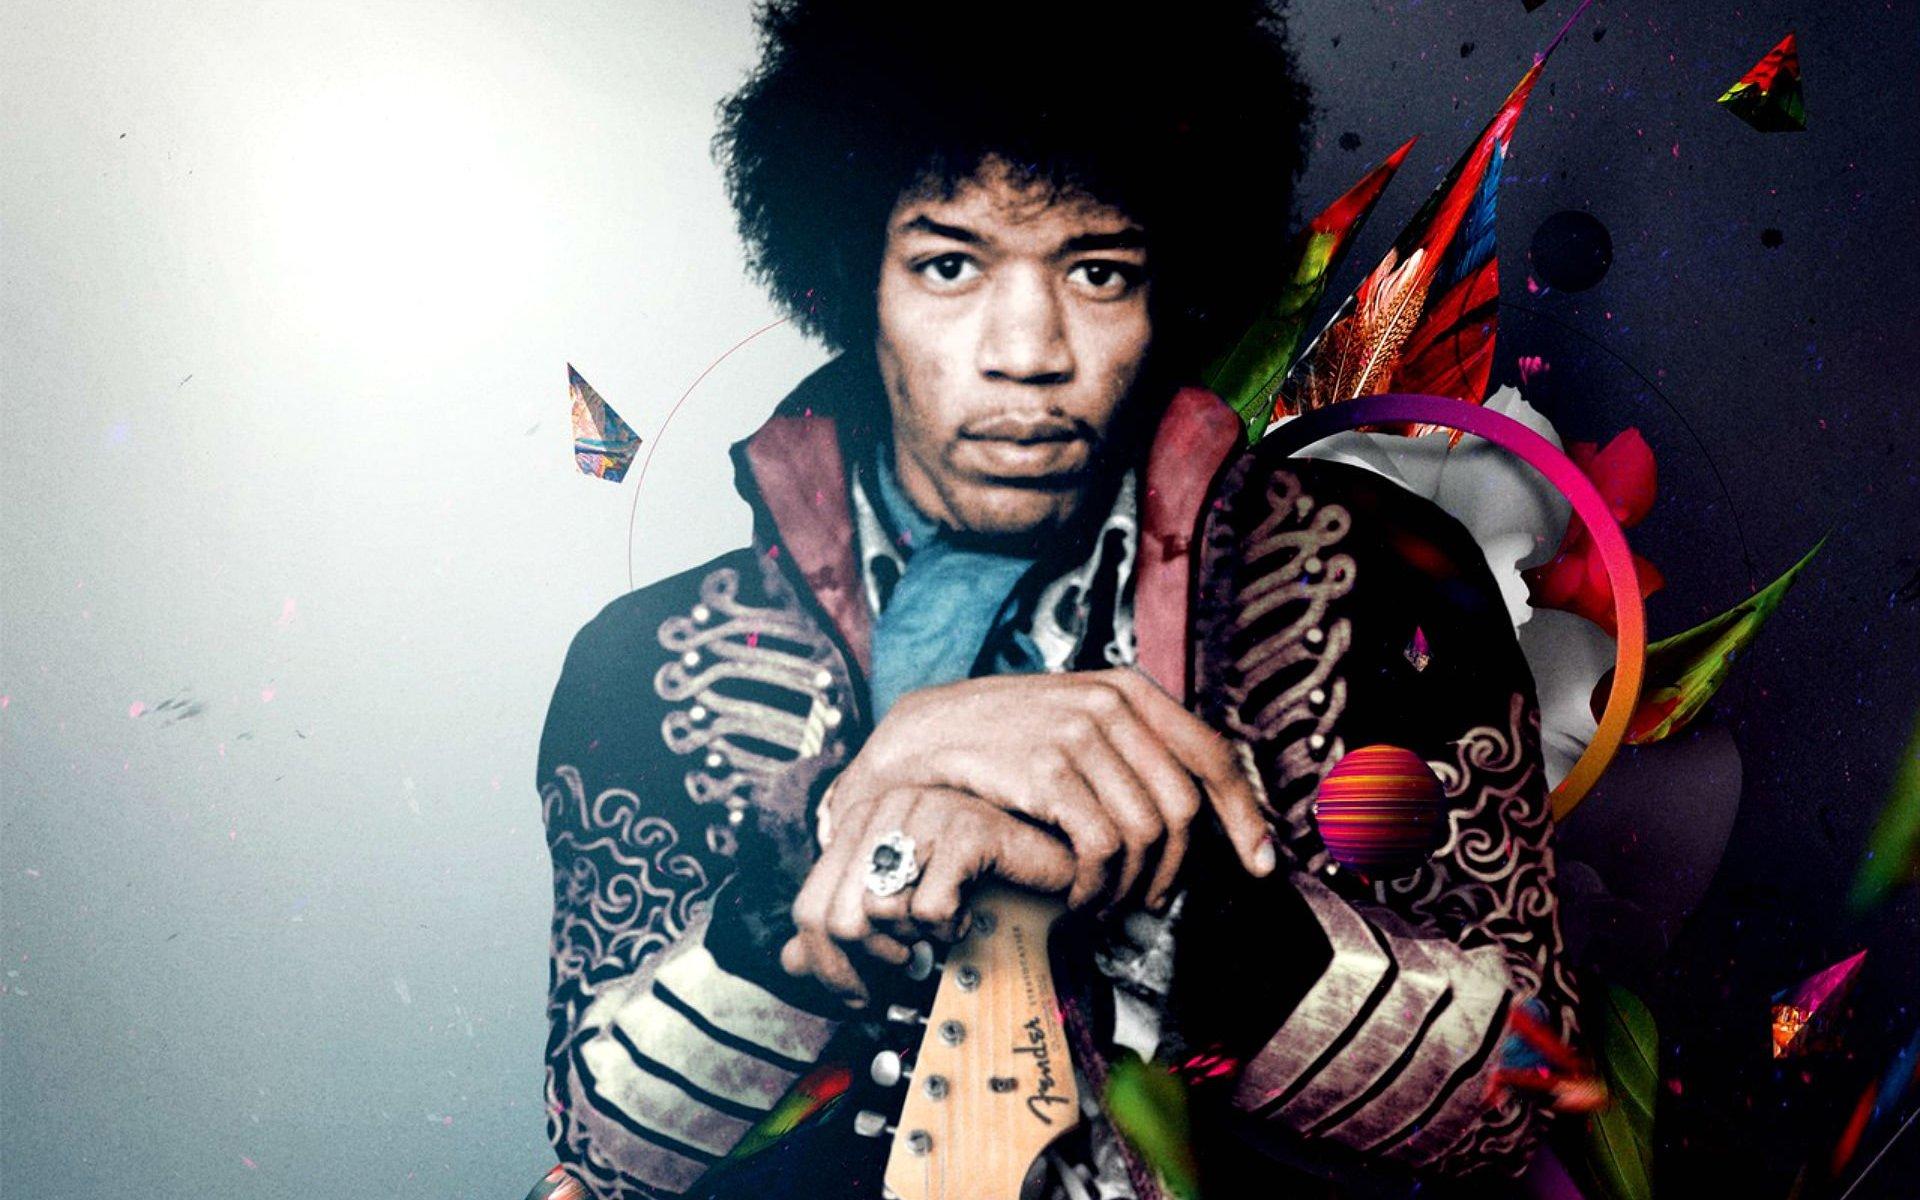 Bullet For My Valentine Wallpaper Hd Download Free Jimi Hendrix Wallpapers Pixelstalk Net